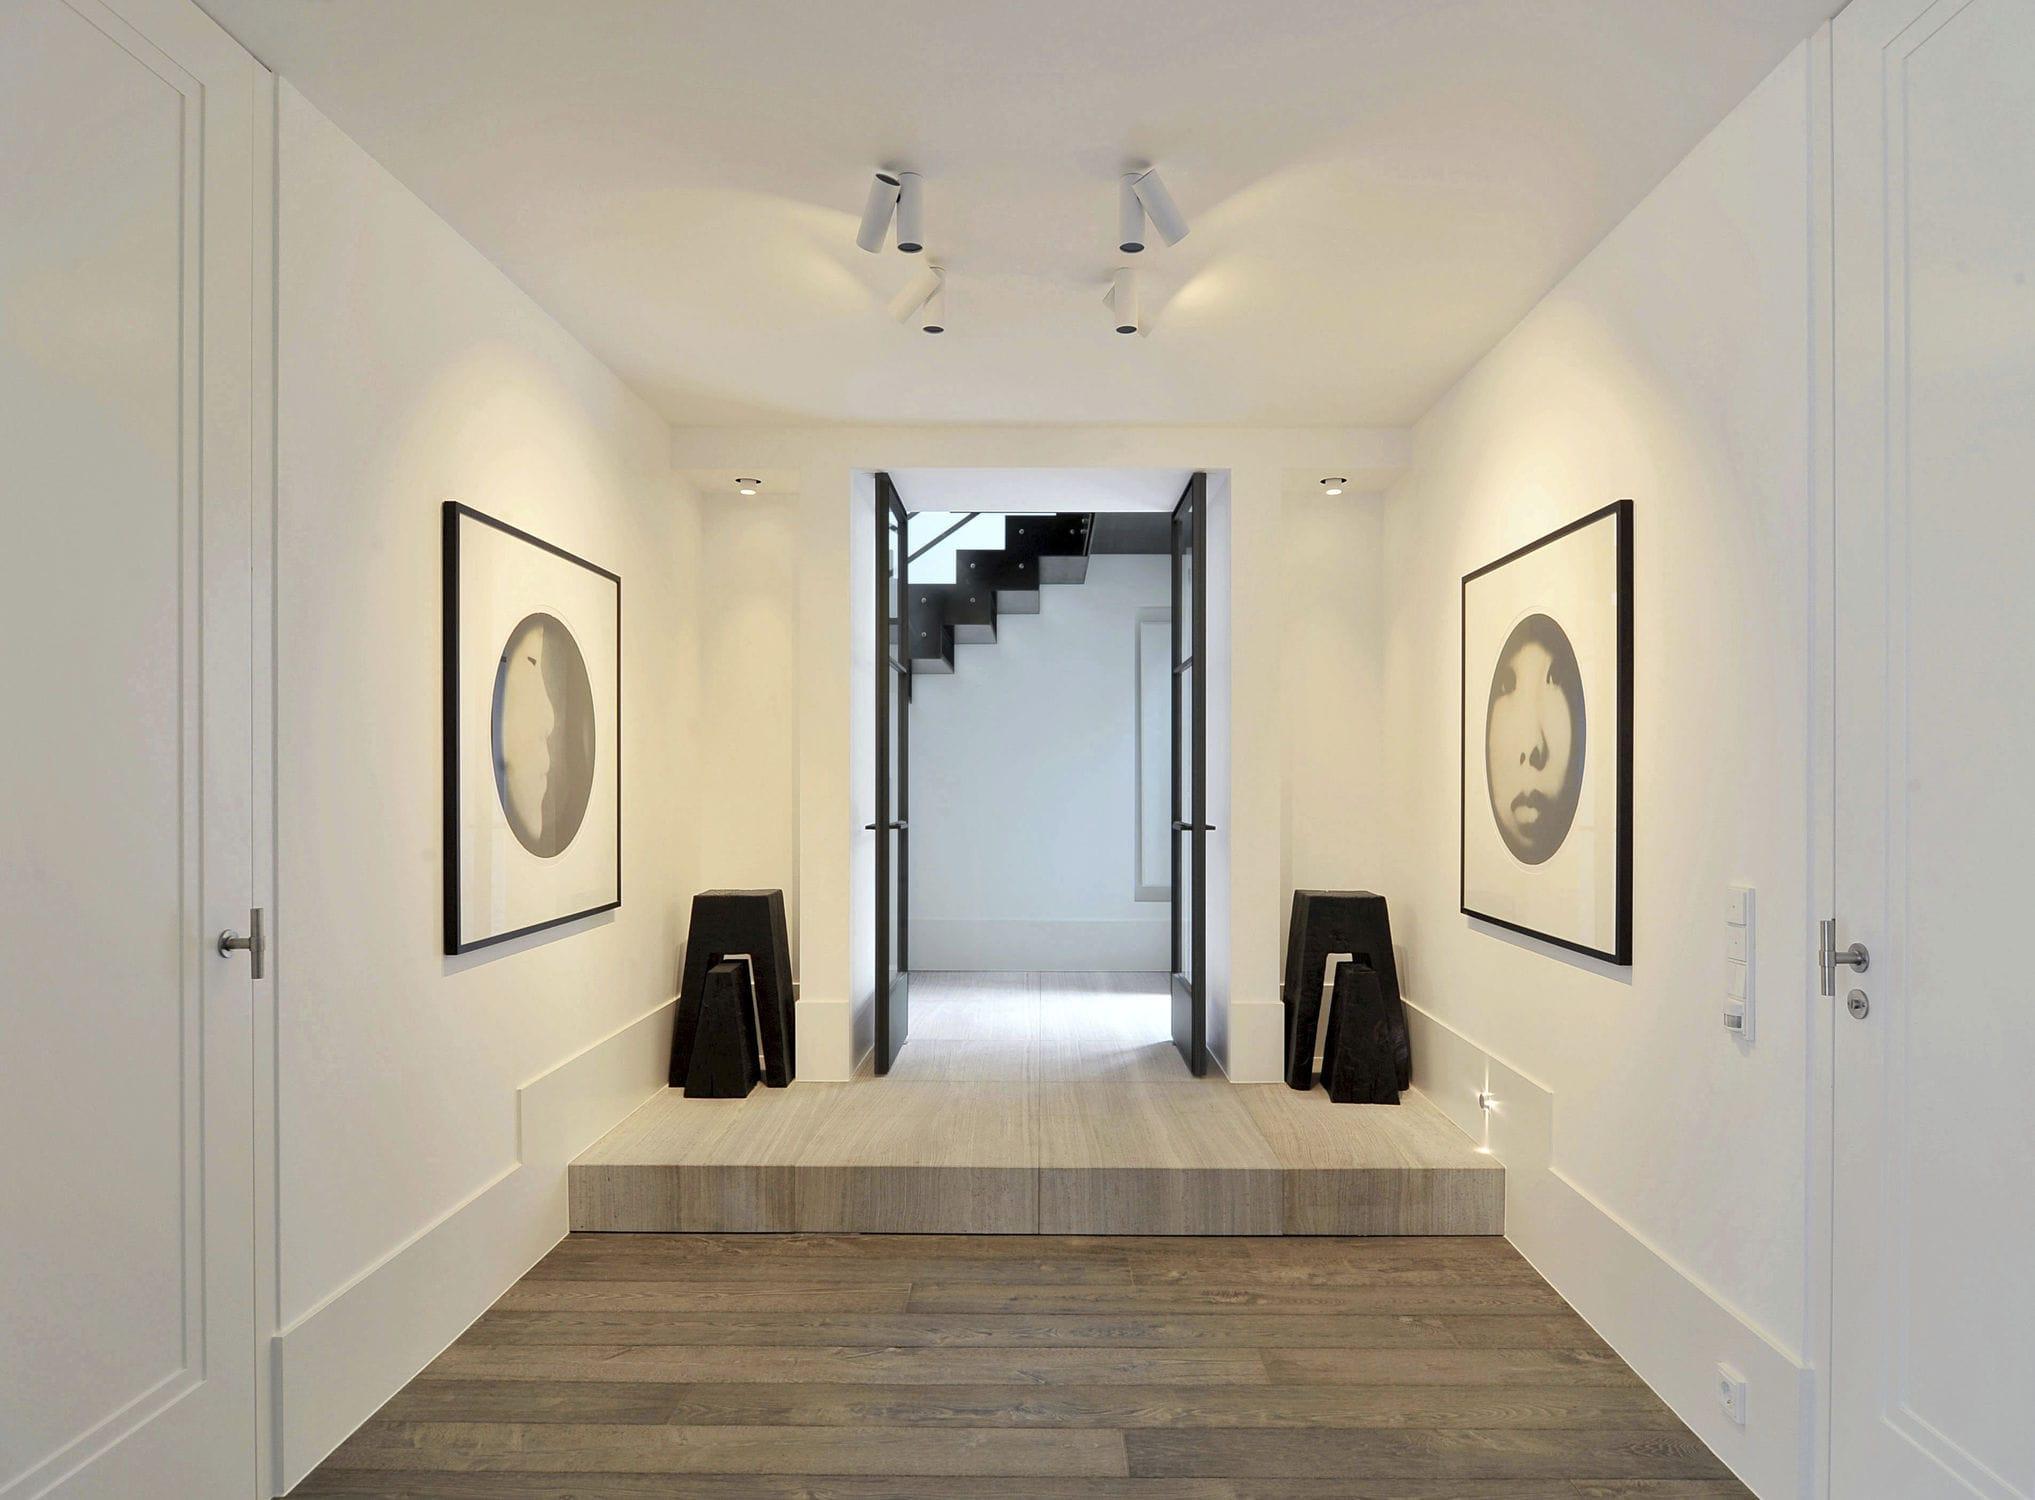 Tantissime idee originali per arredare una casa grande for Idee originali per la casa